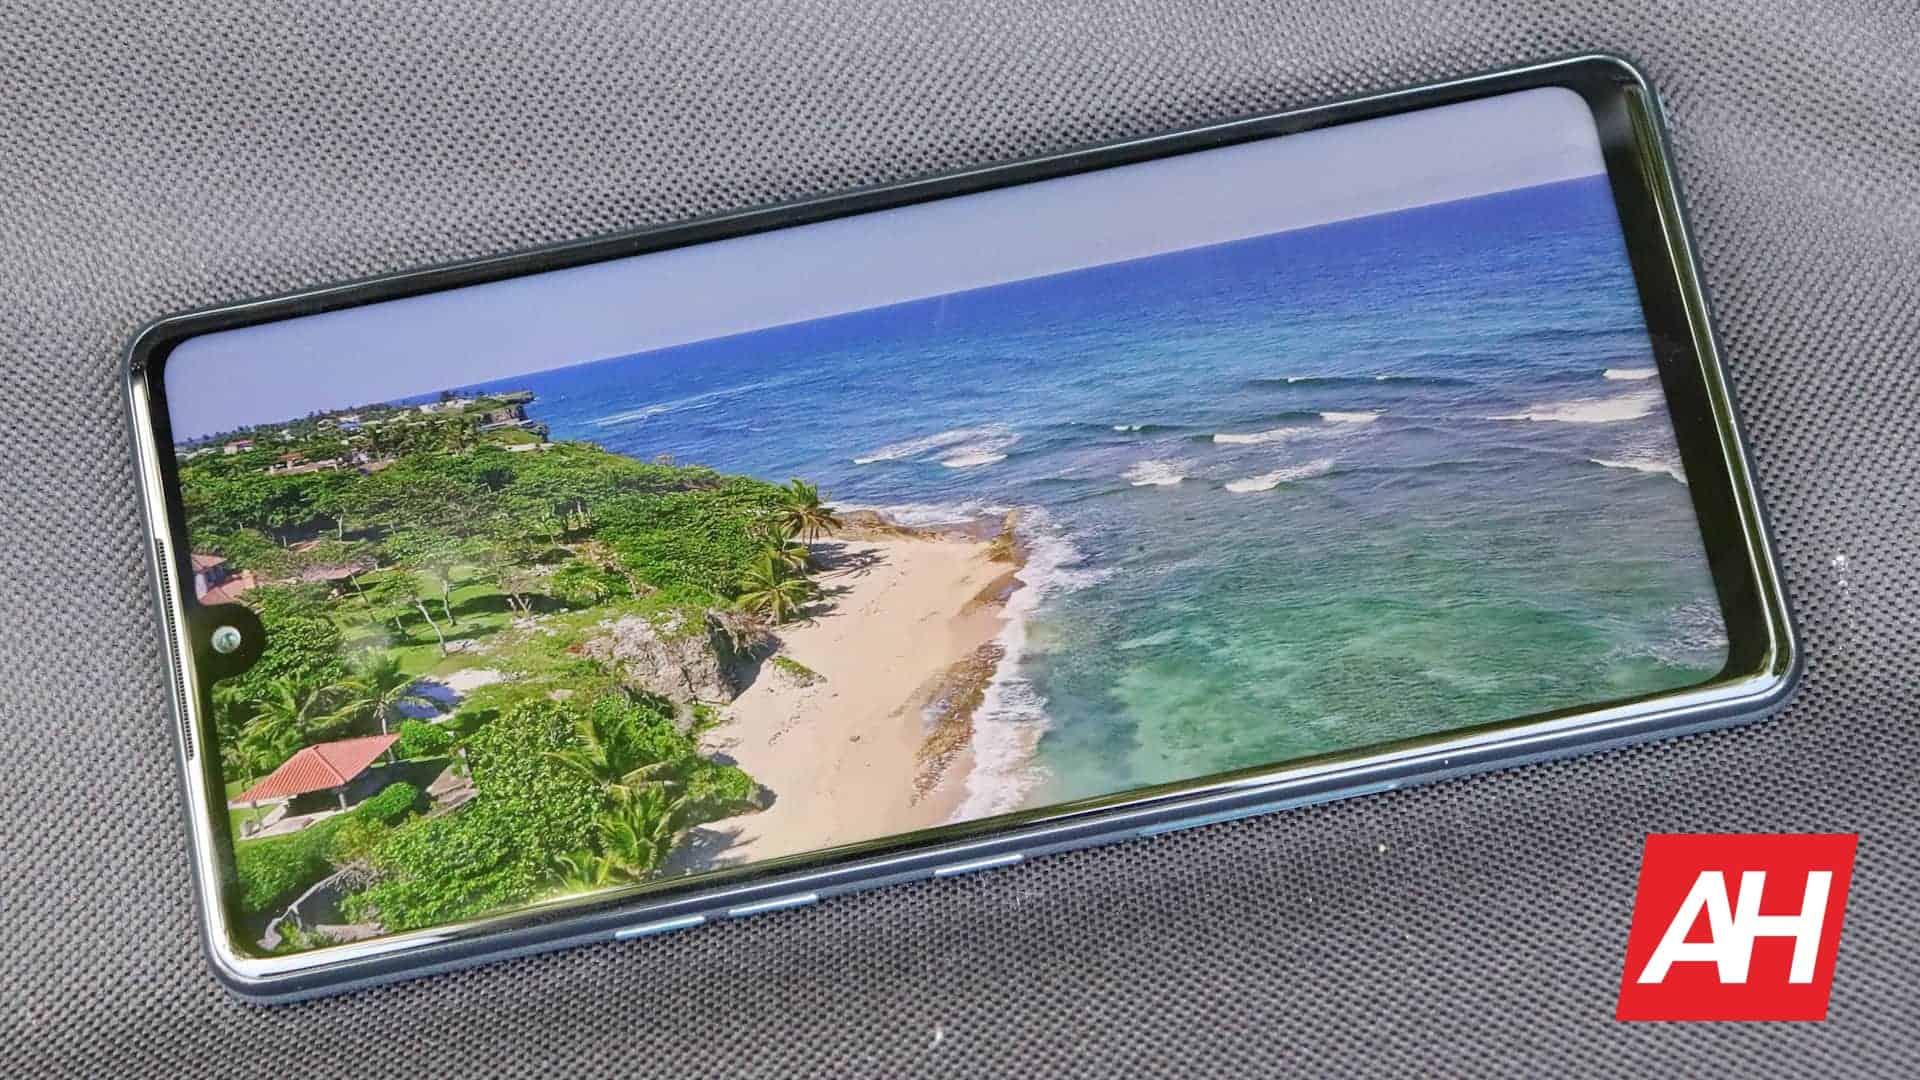 04 Display LG Stylo 6 Review AH 2020